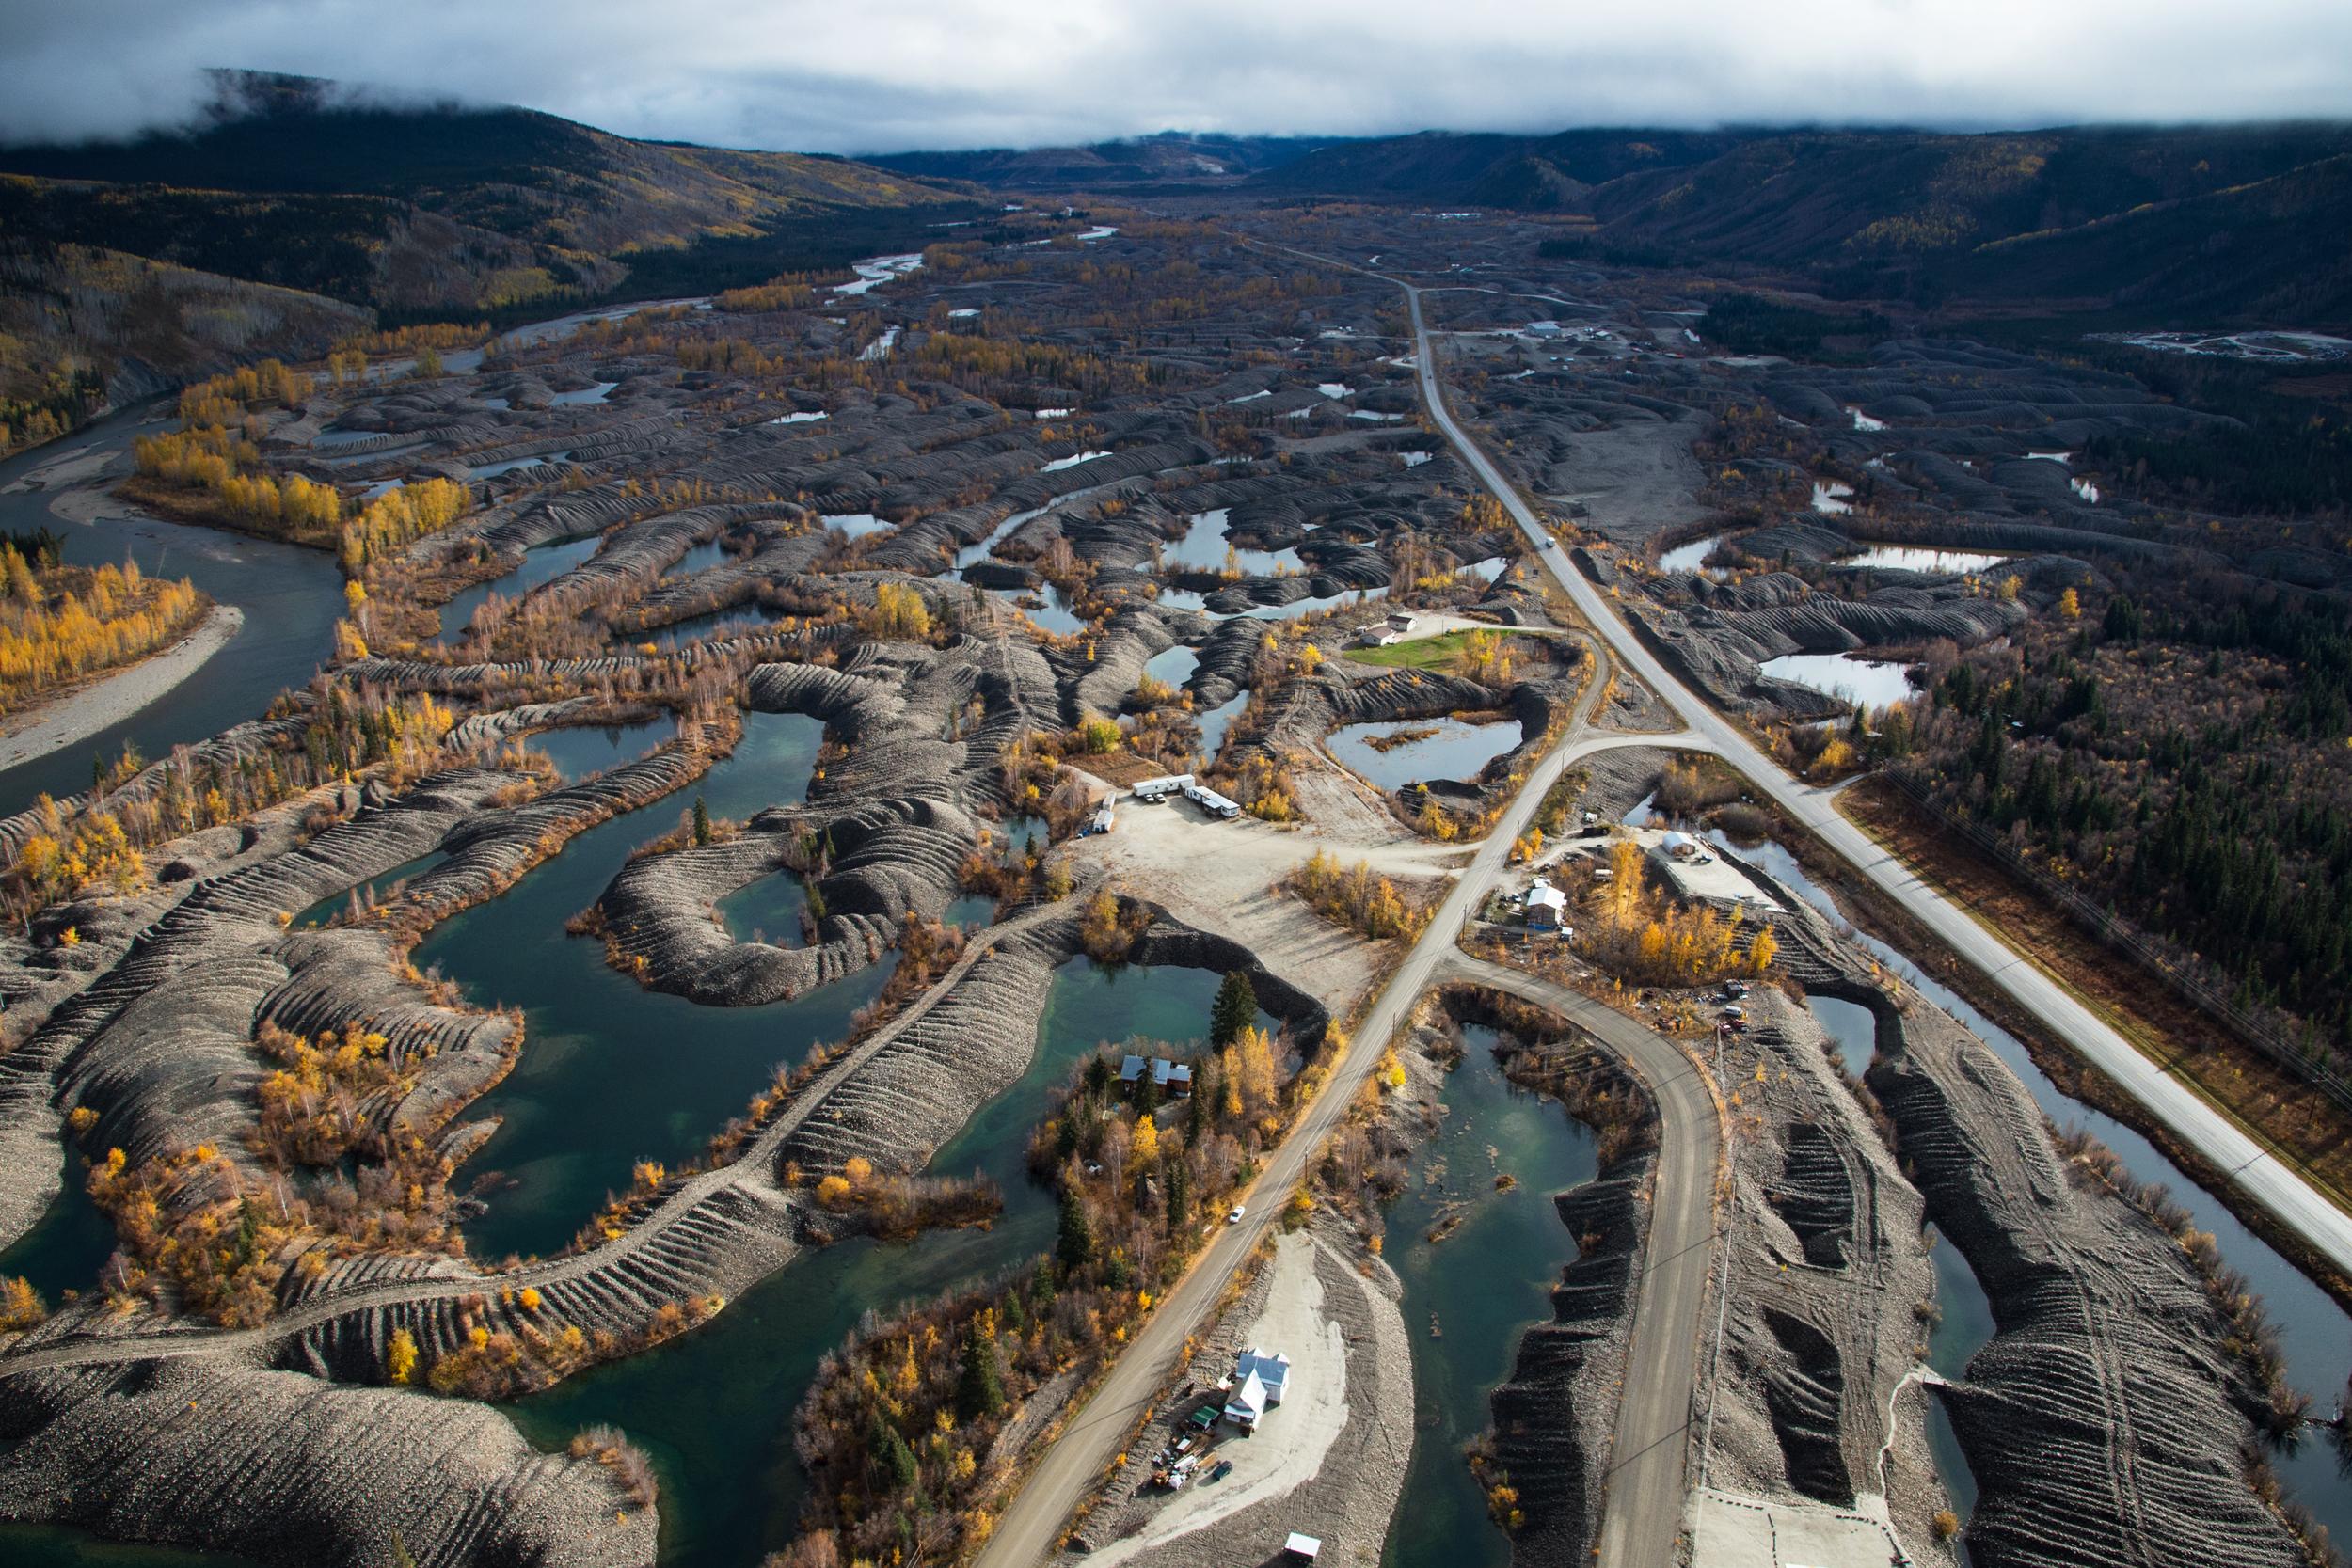 Placer mining Klondike River Dawson City Yukon Peter Mather